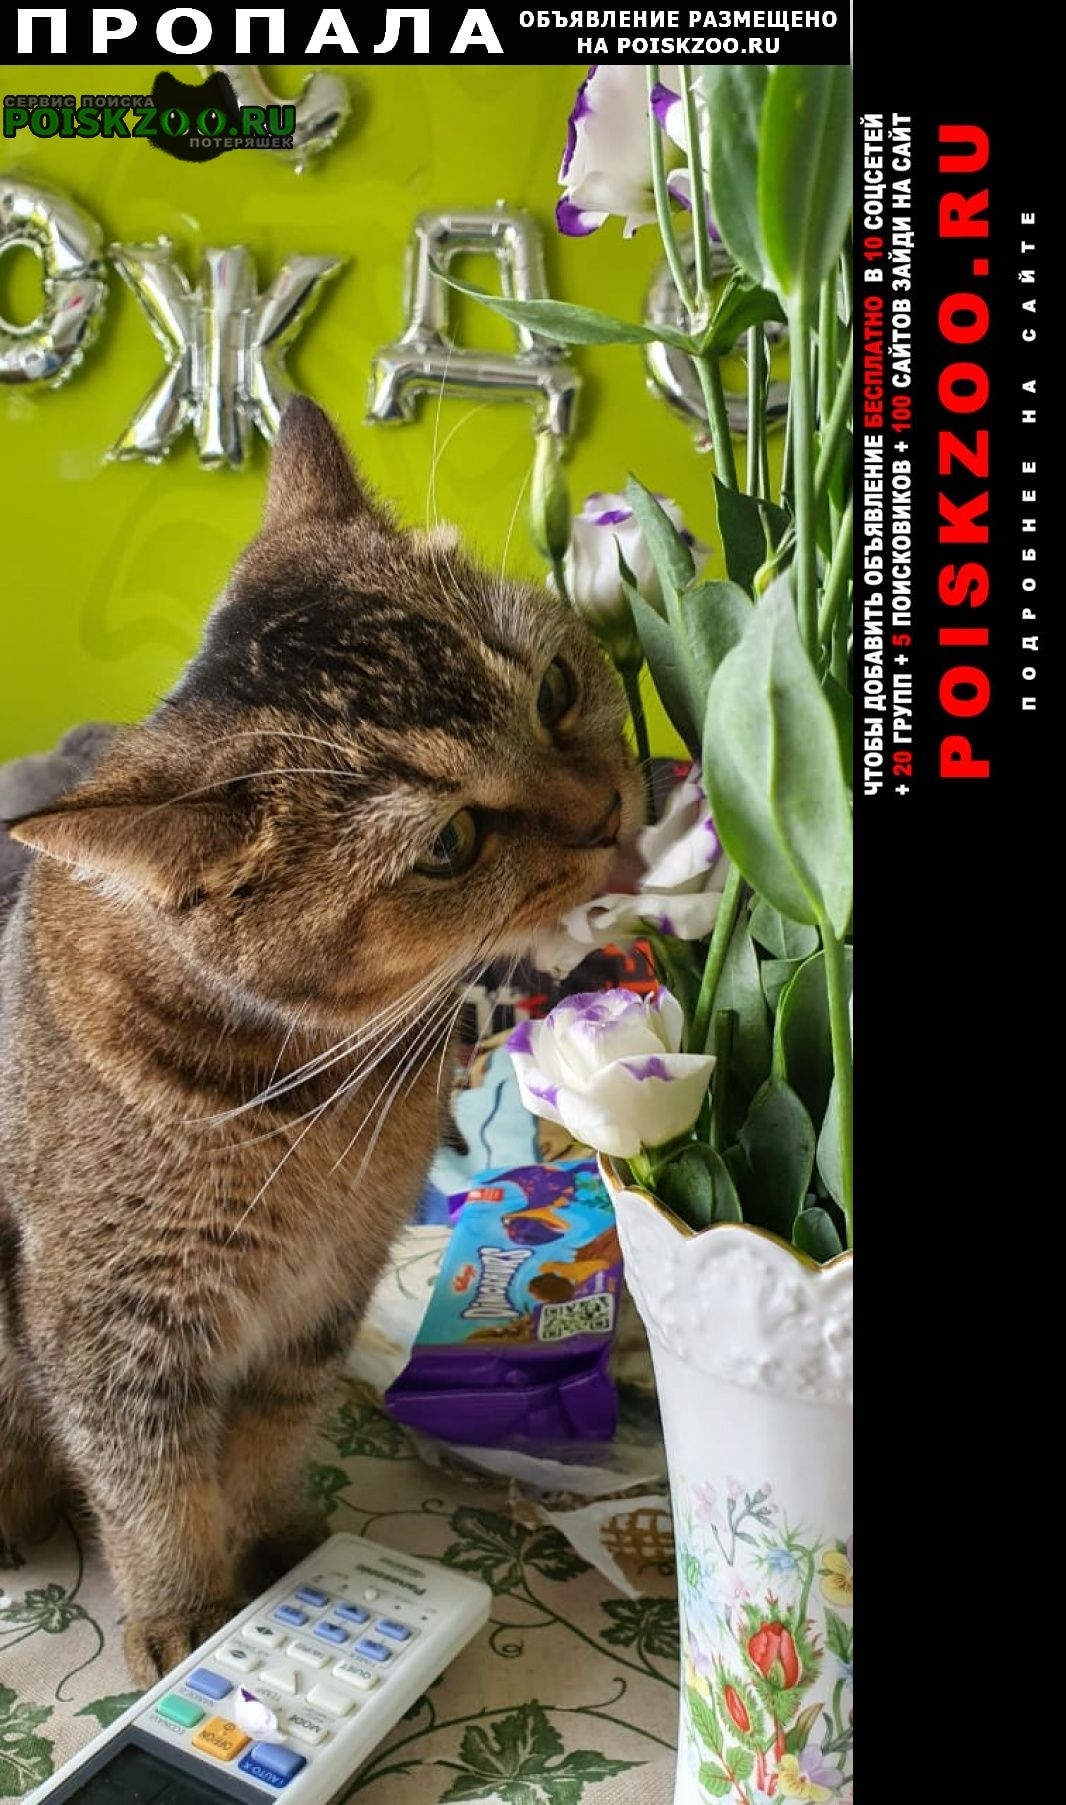 Пропала кошка военвед сити Ростов-на-Дону